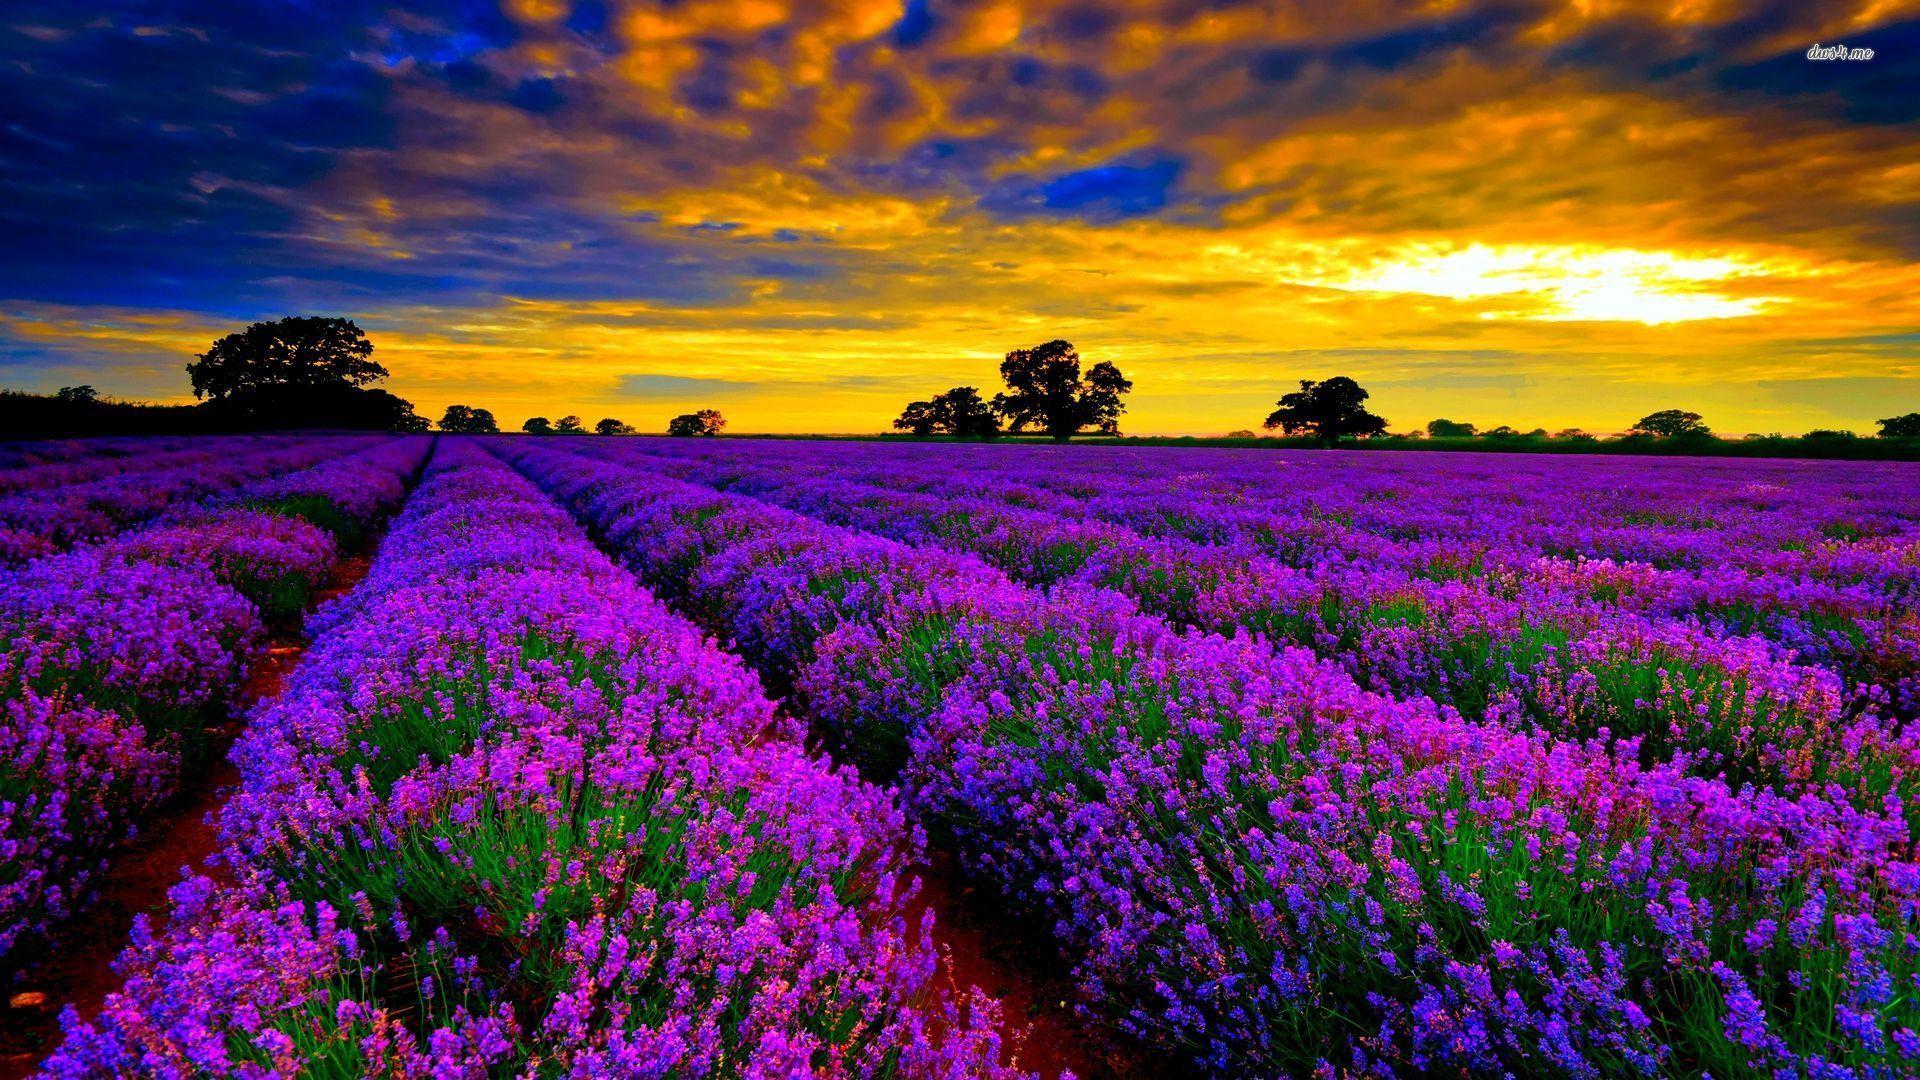 42603-lavender-field-at-sunset-1920x1080-flower-wallpaper